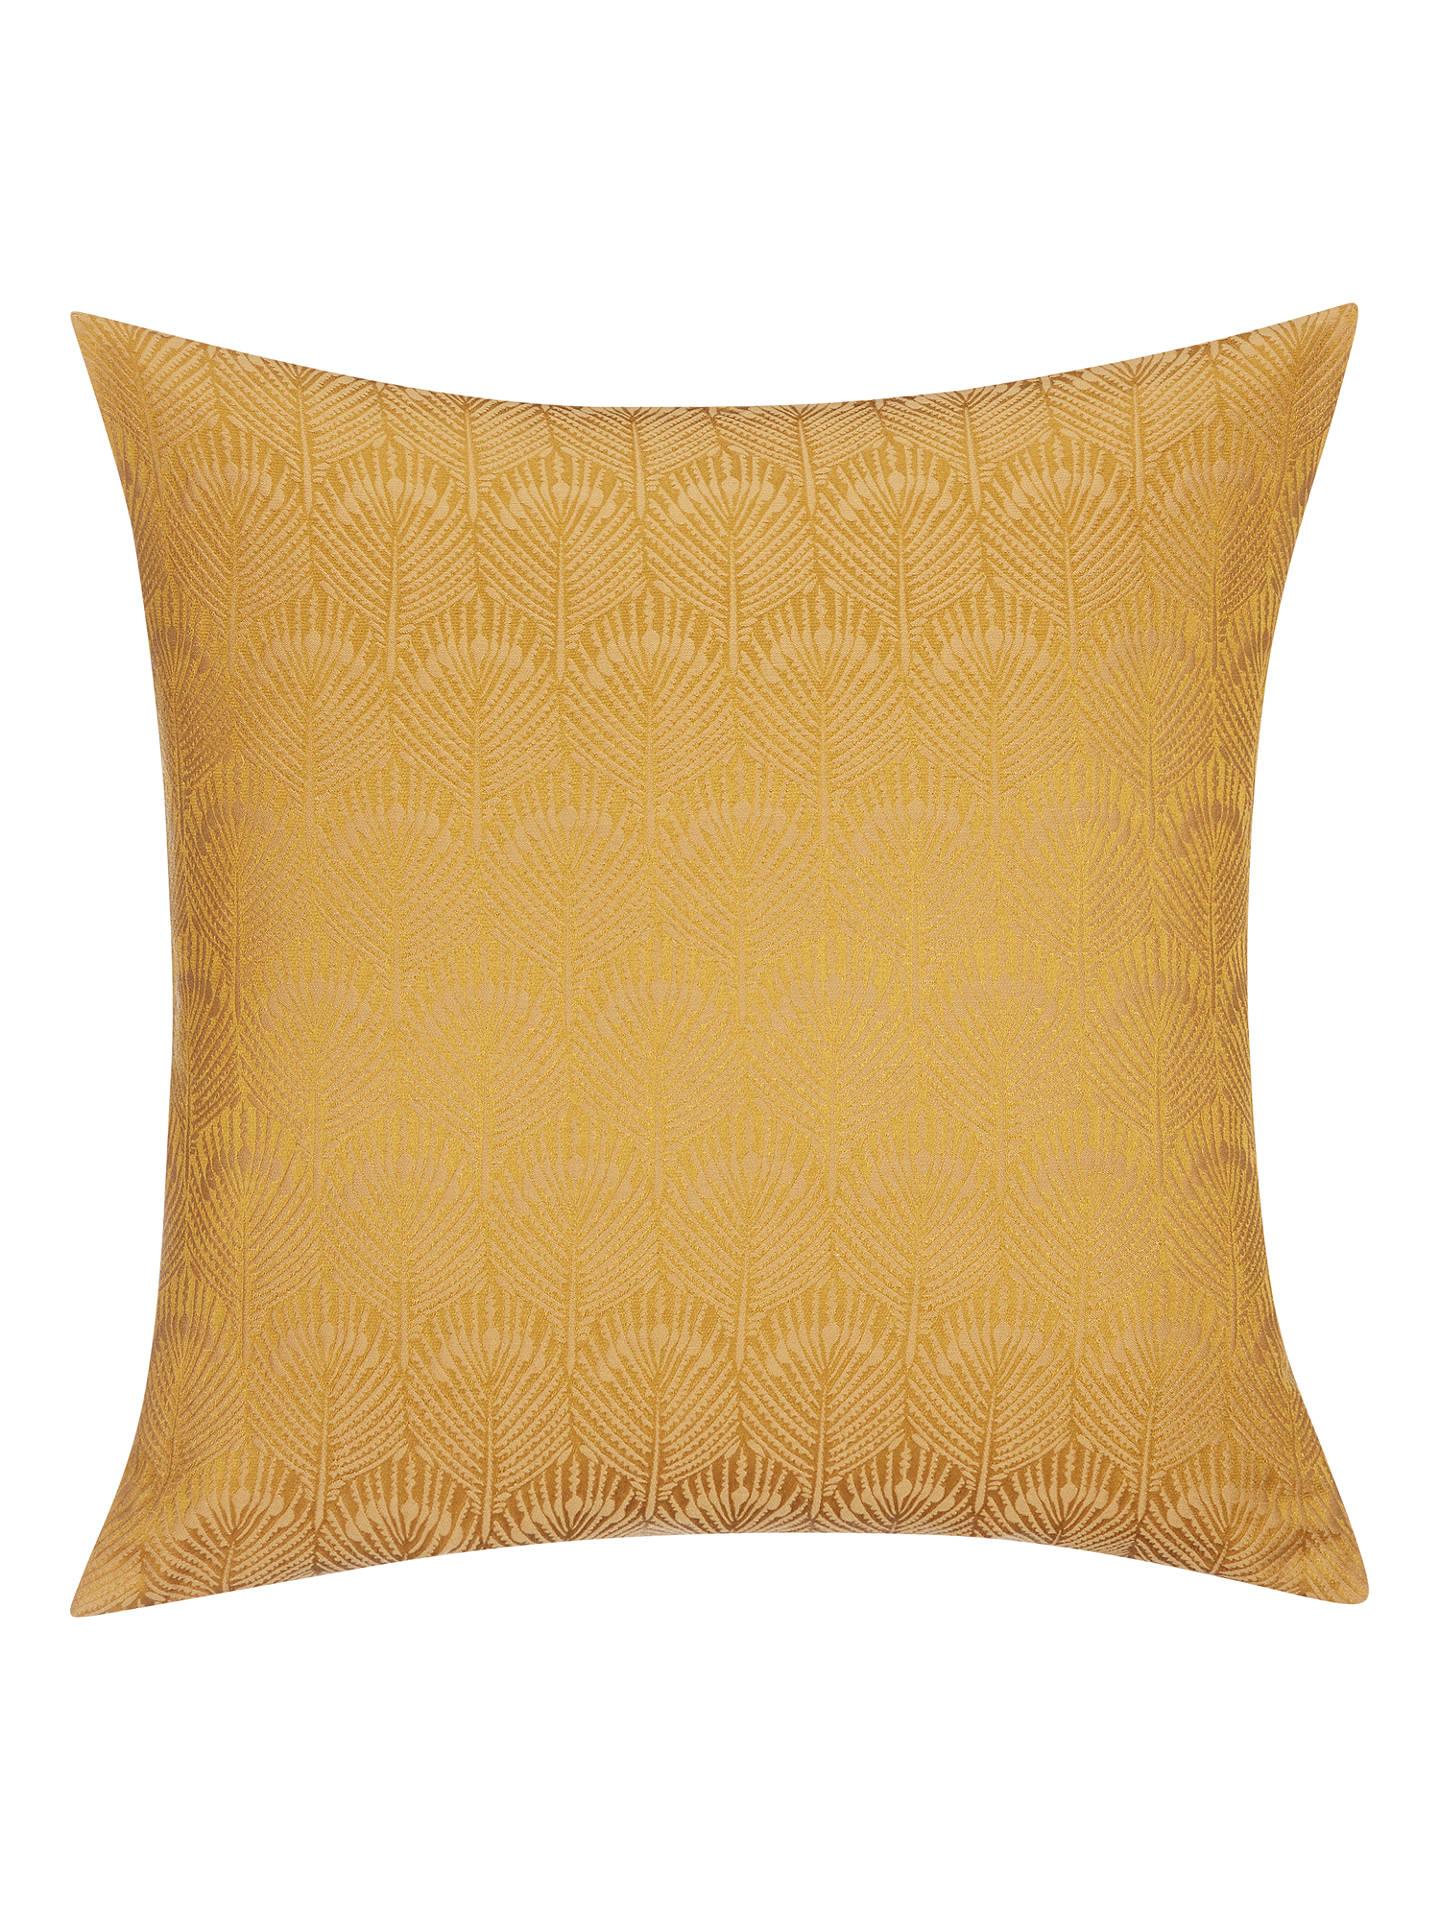 john lewis partners pavone cushion gold at john lewis. Black Bedroom Furniture Sets. Home Design Ideas